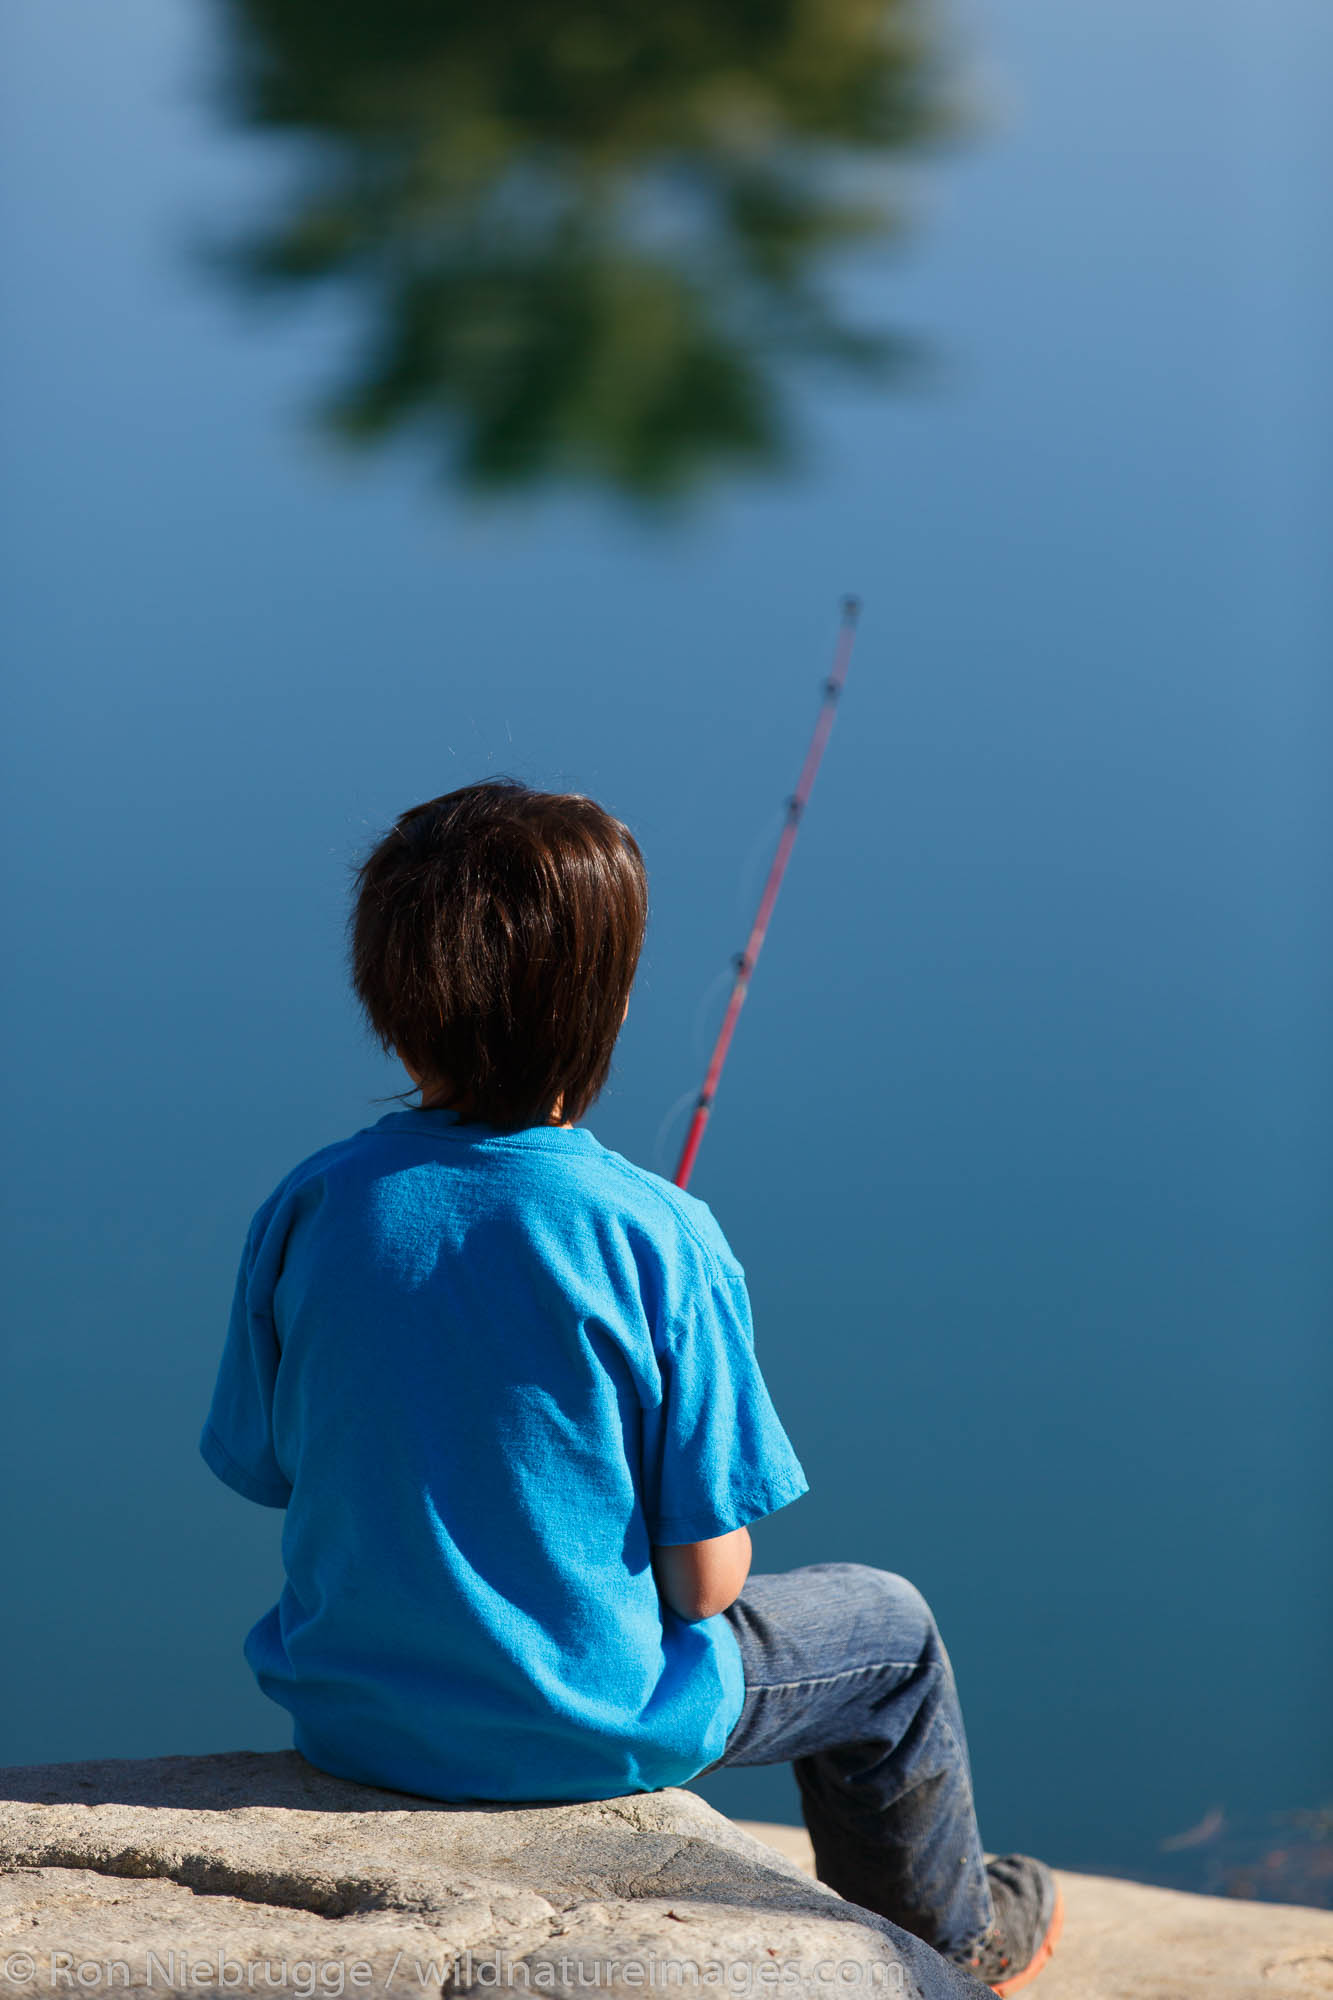 Fishing at the Springs of Borrego, Borrego Springs, California. (model released)